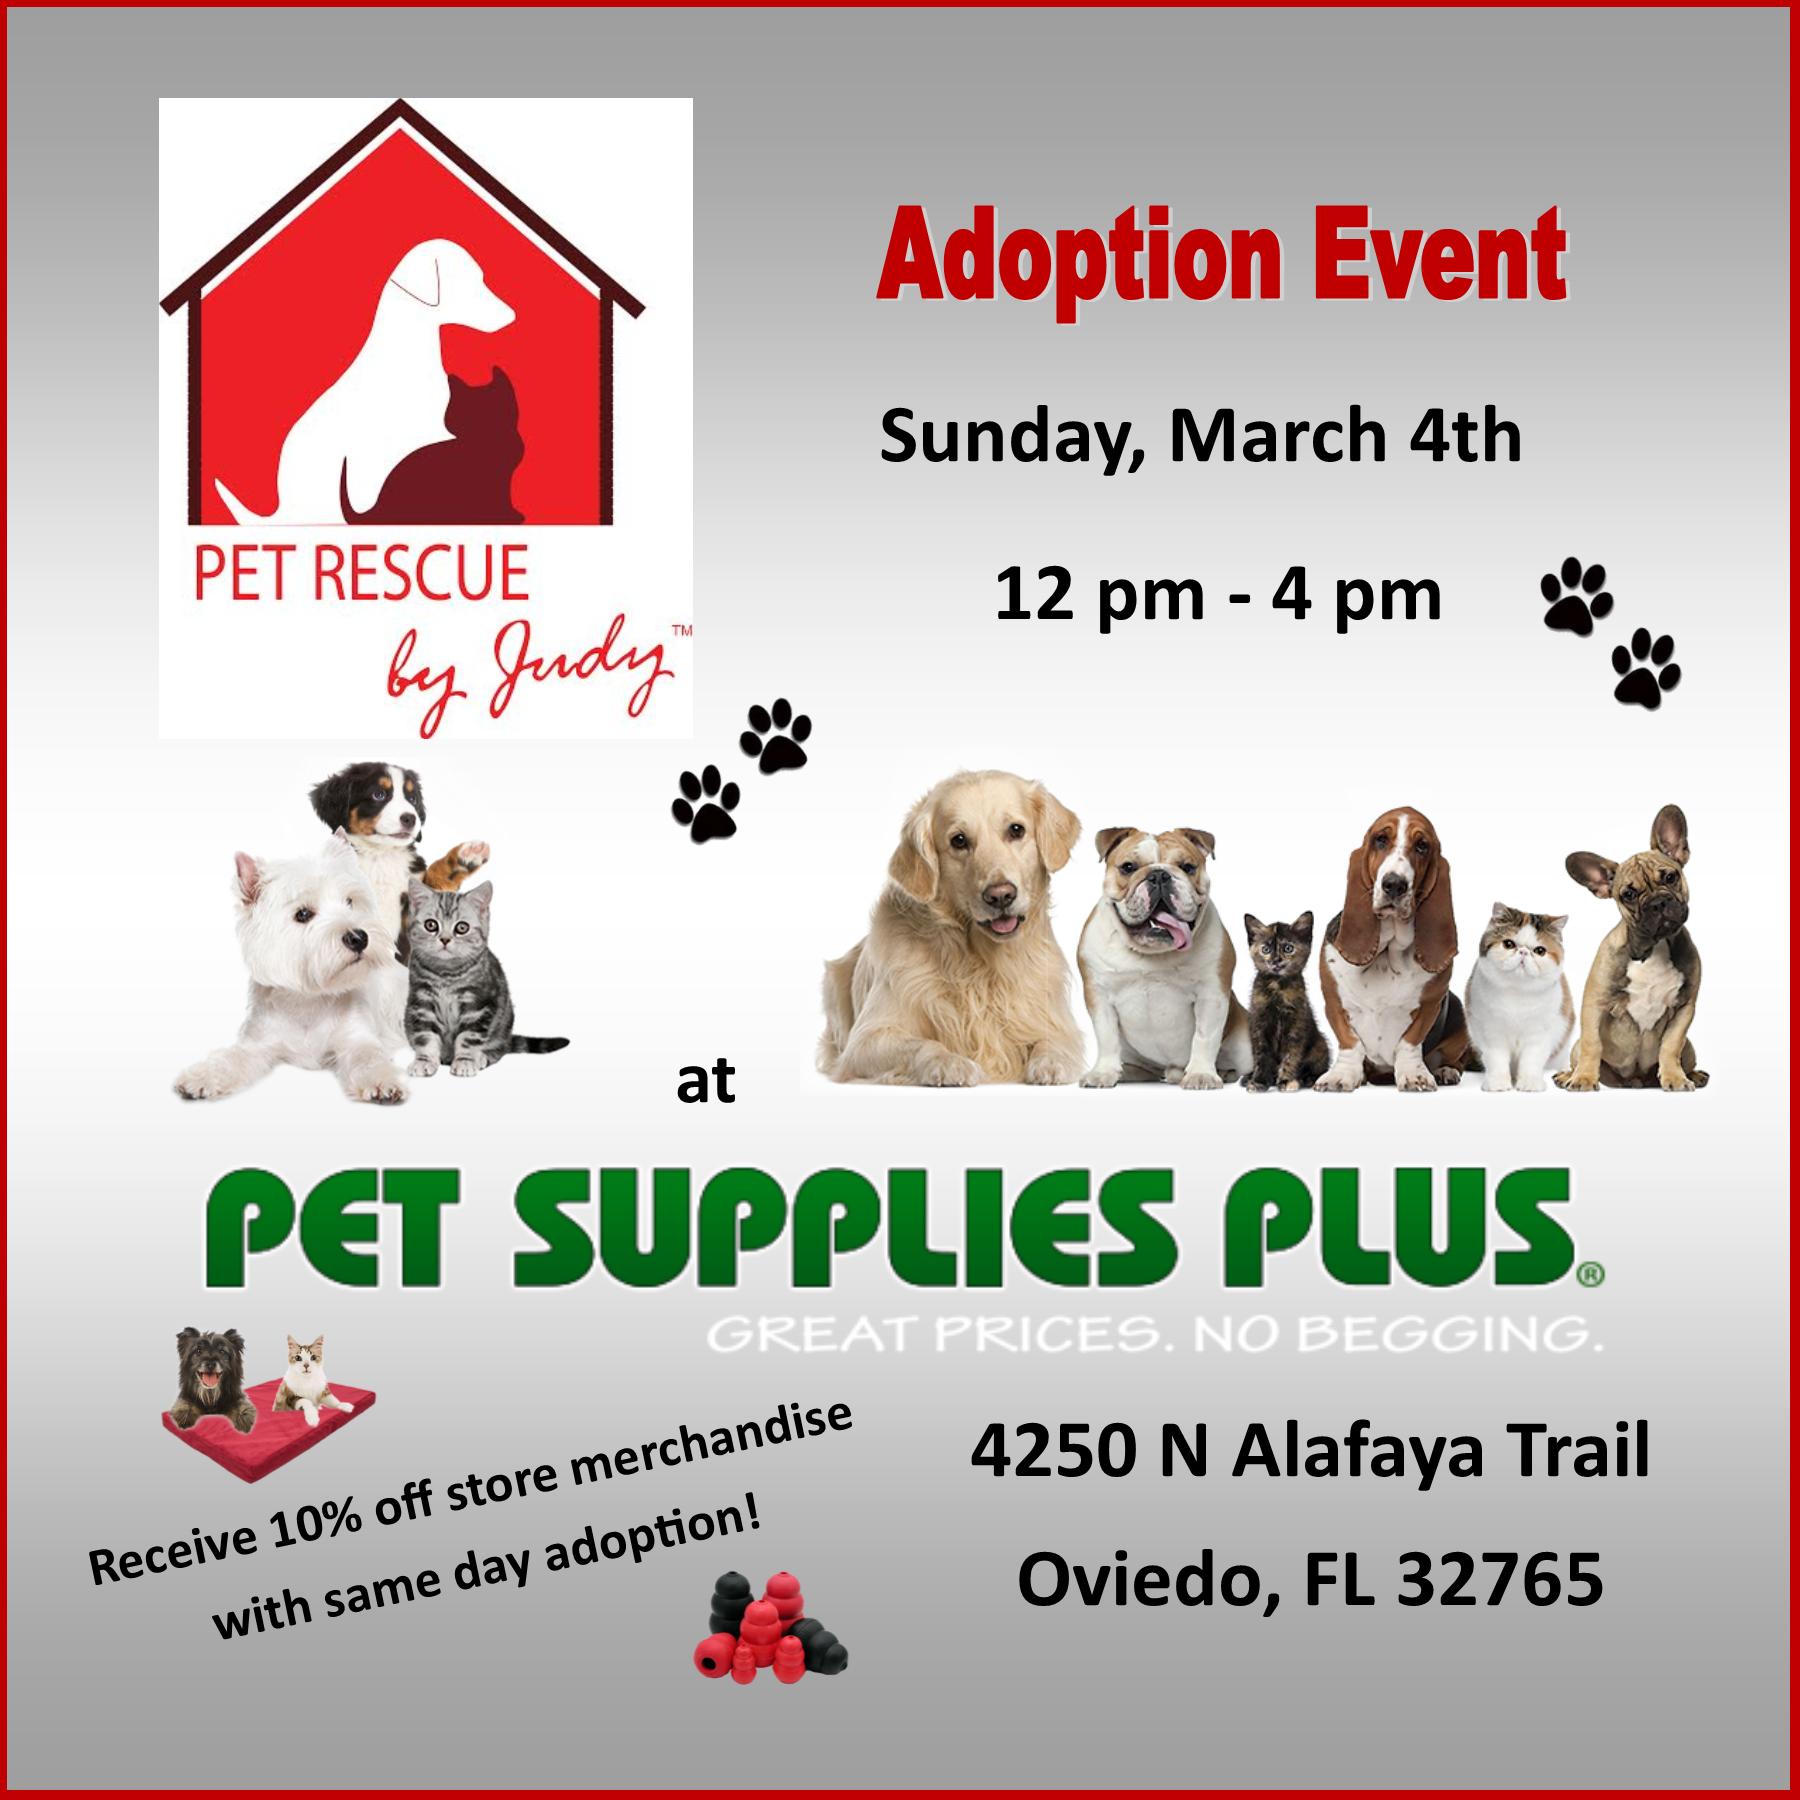 Events pet supplies plus adoption event sunday march 4th 2018 1200 pm until 0400 pm location pet supplies plus map 4250 n alafaya trail oviedo fl 32765 solutioingenieria Images